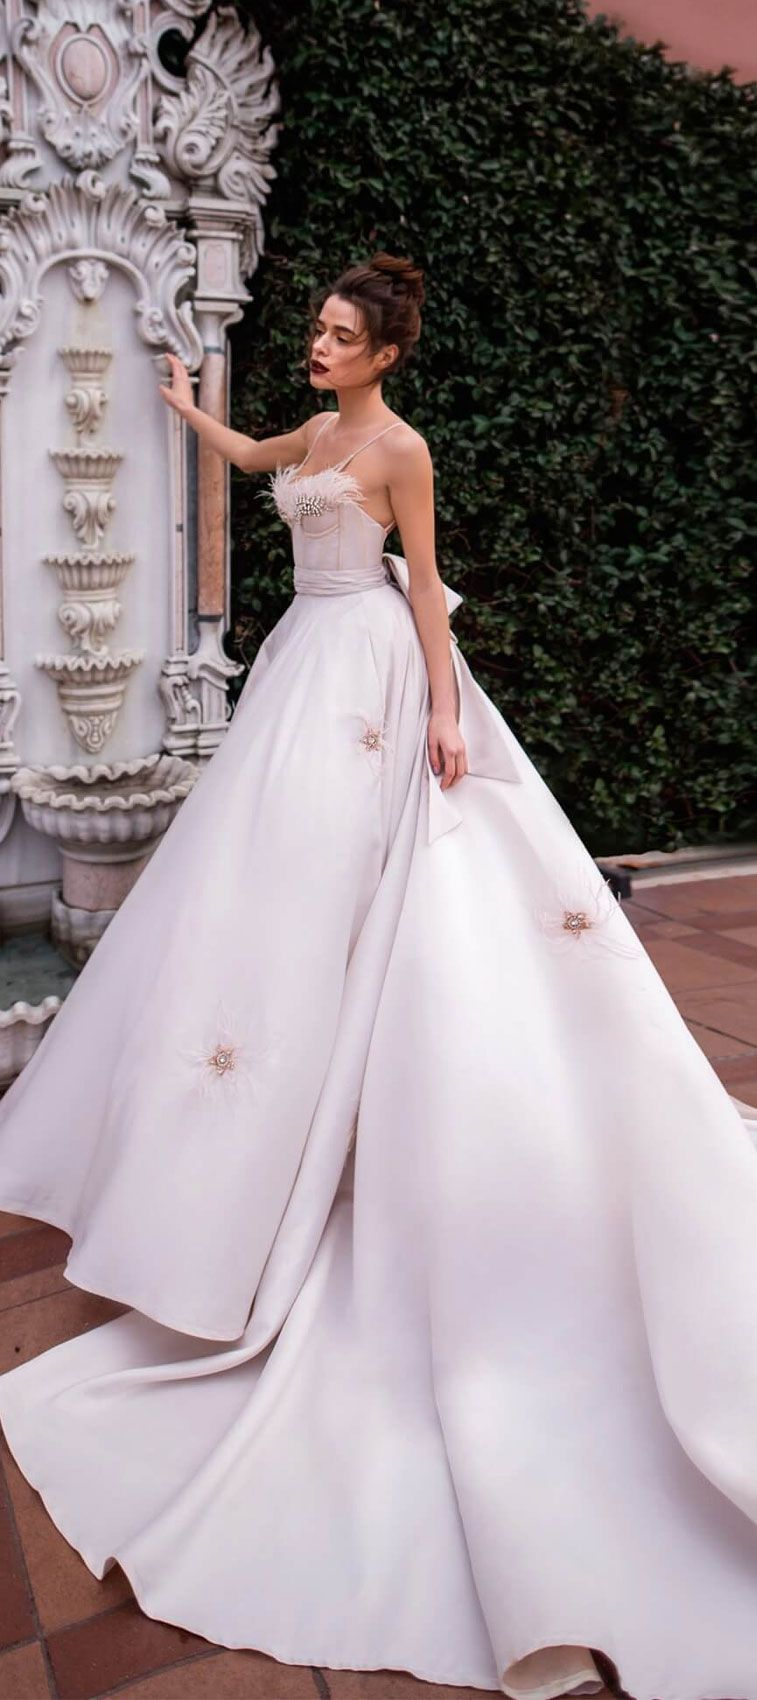 Blammobiamo wedding dresses wedding pinterest wedding dresses